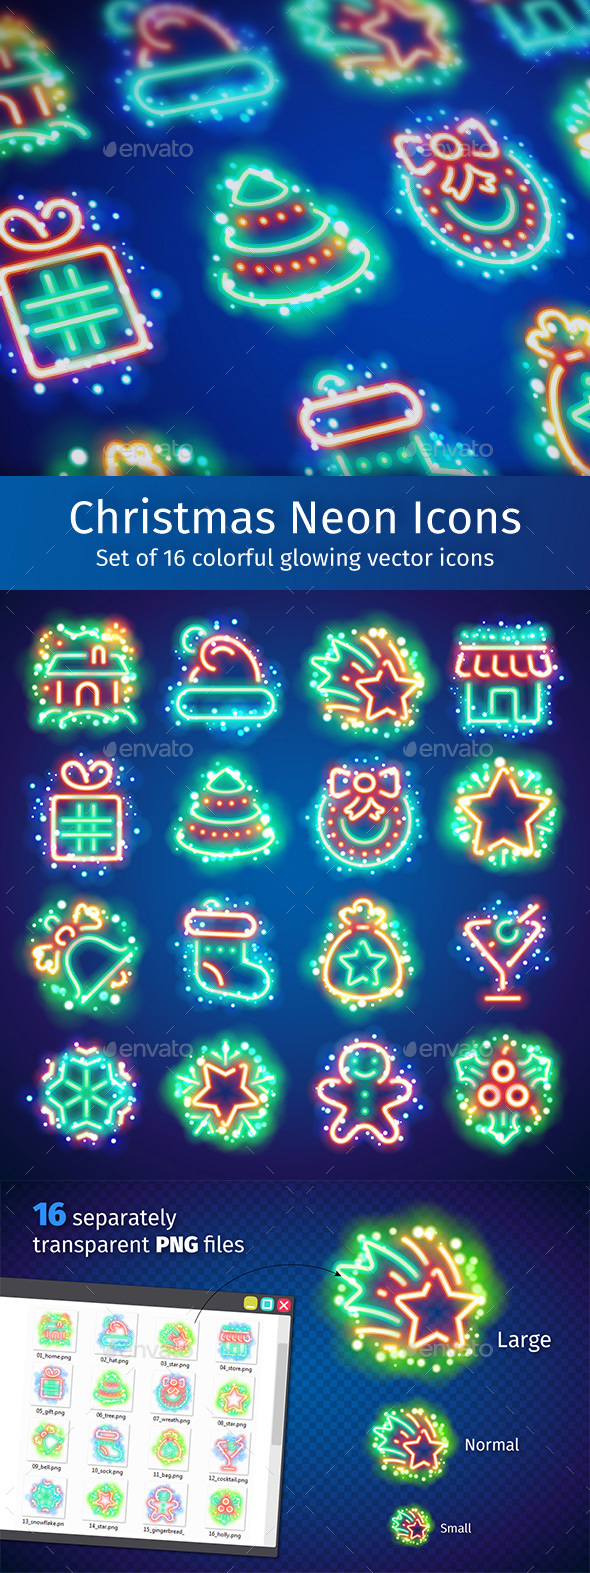 Christmas Neon Icons with Magic Sparkles - Seasonal Icons